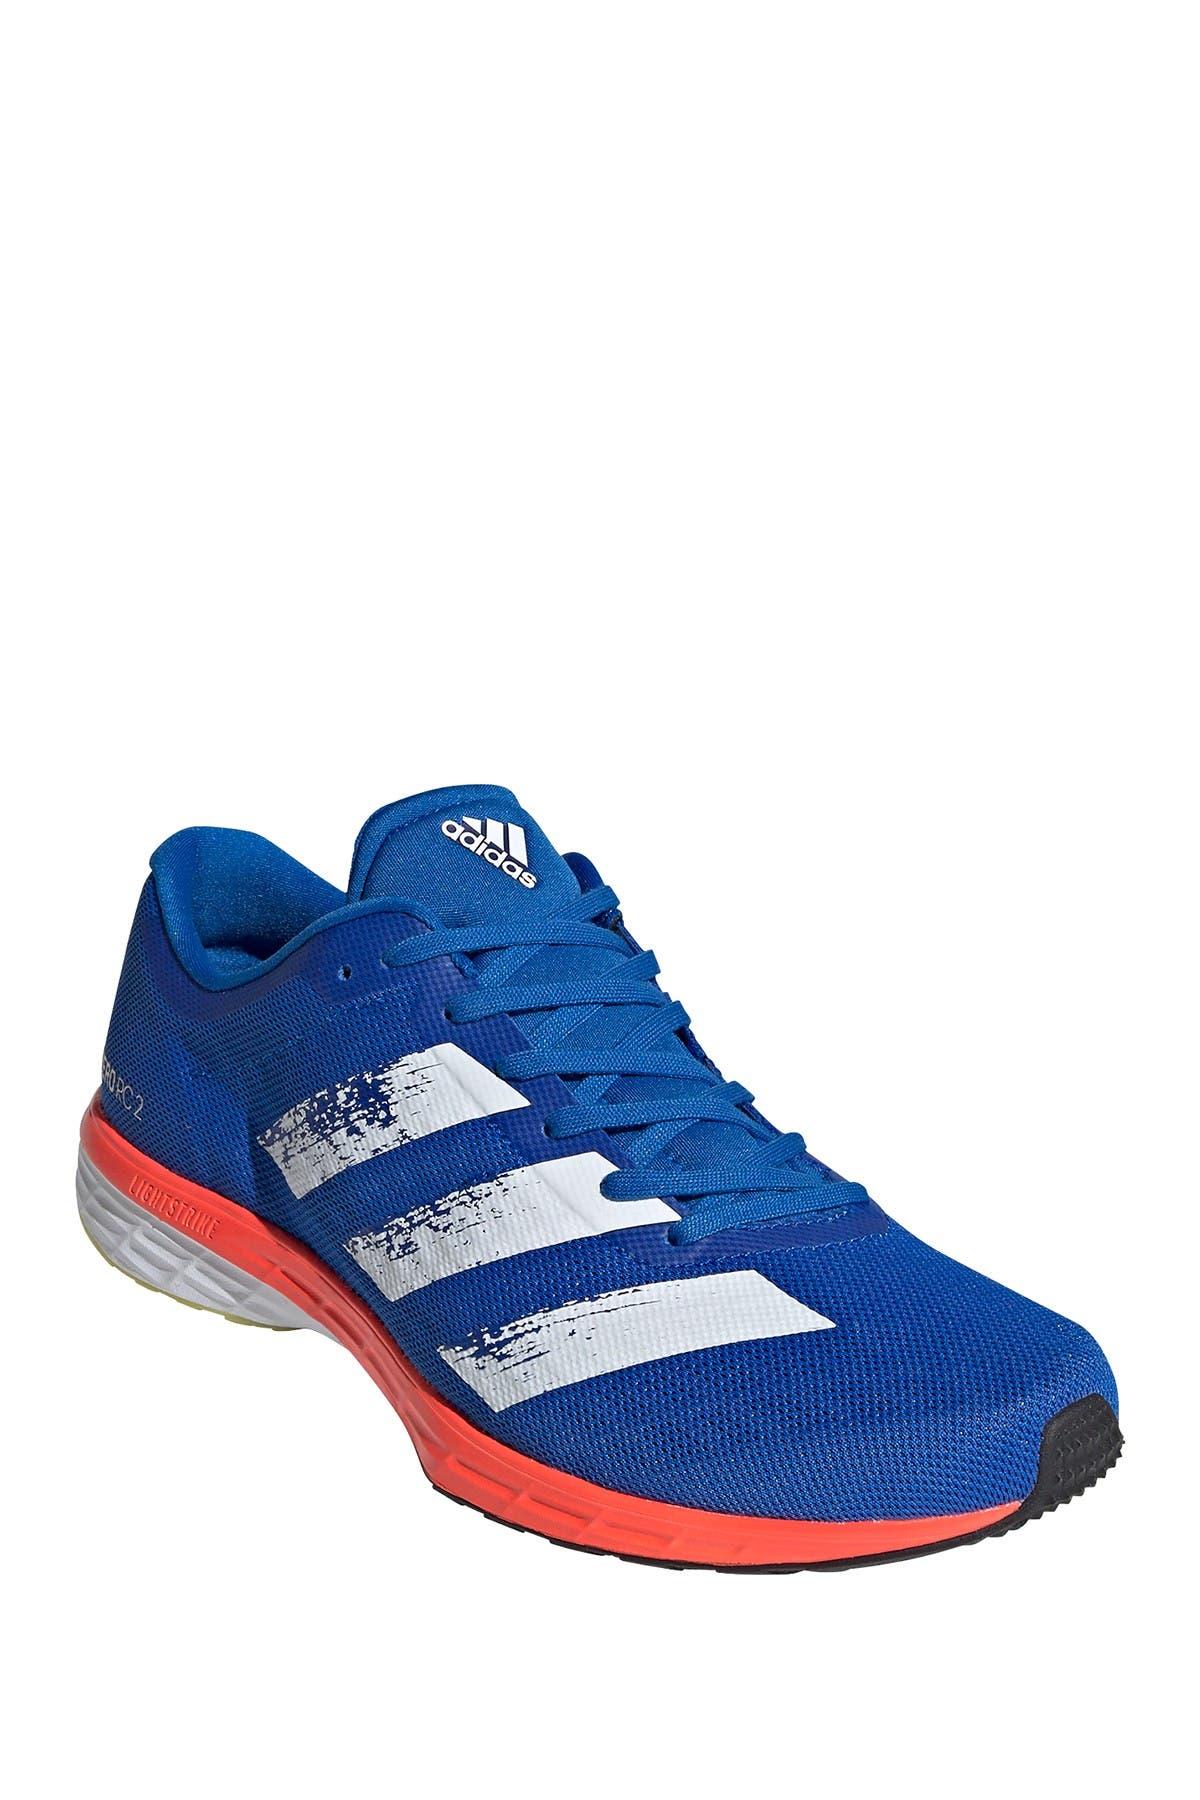 Image of adidas Adizero RC 2.0 Running Shoe